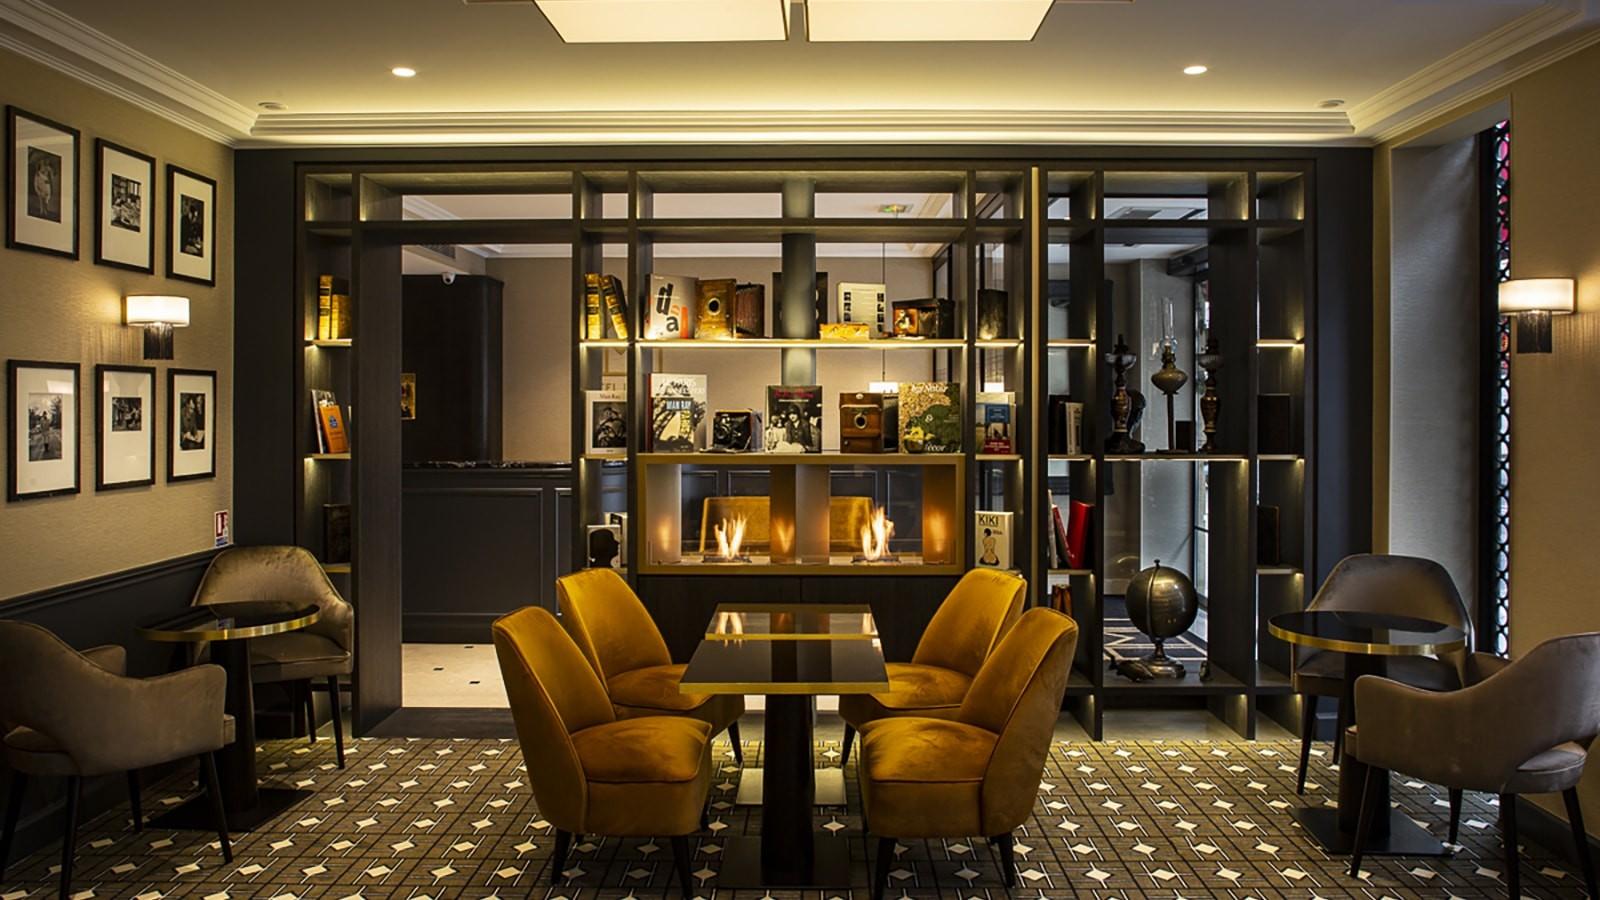 EFI Design Hotel Lenox Paris Efi Design (9) 1163